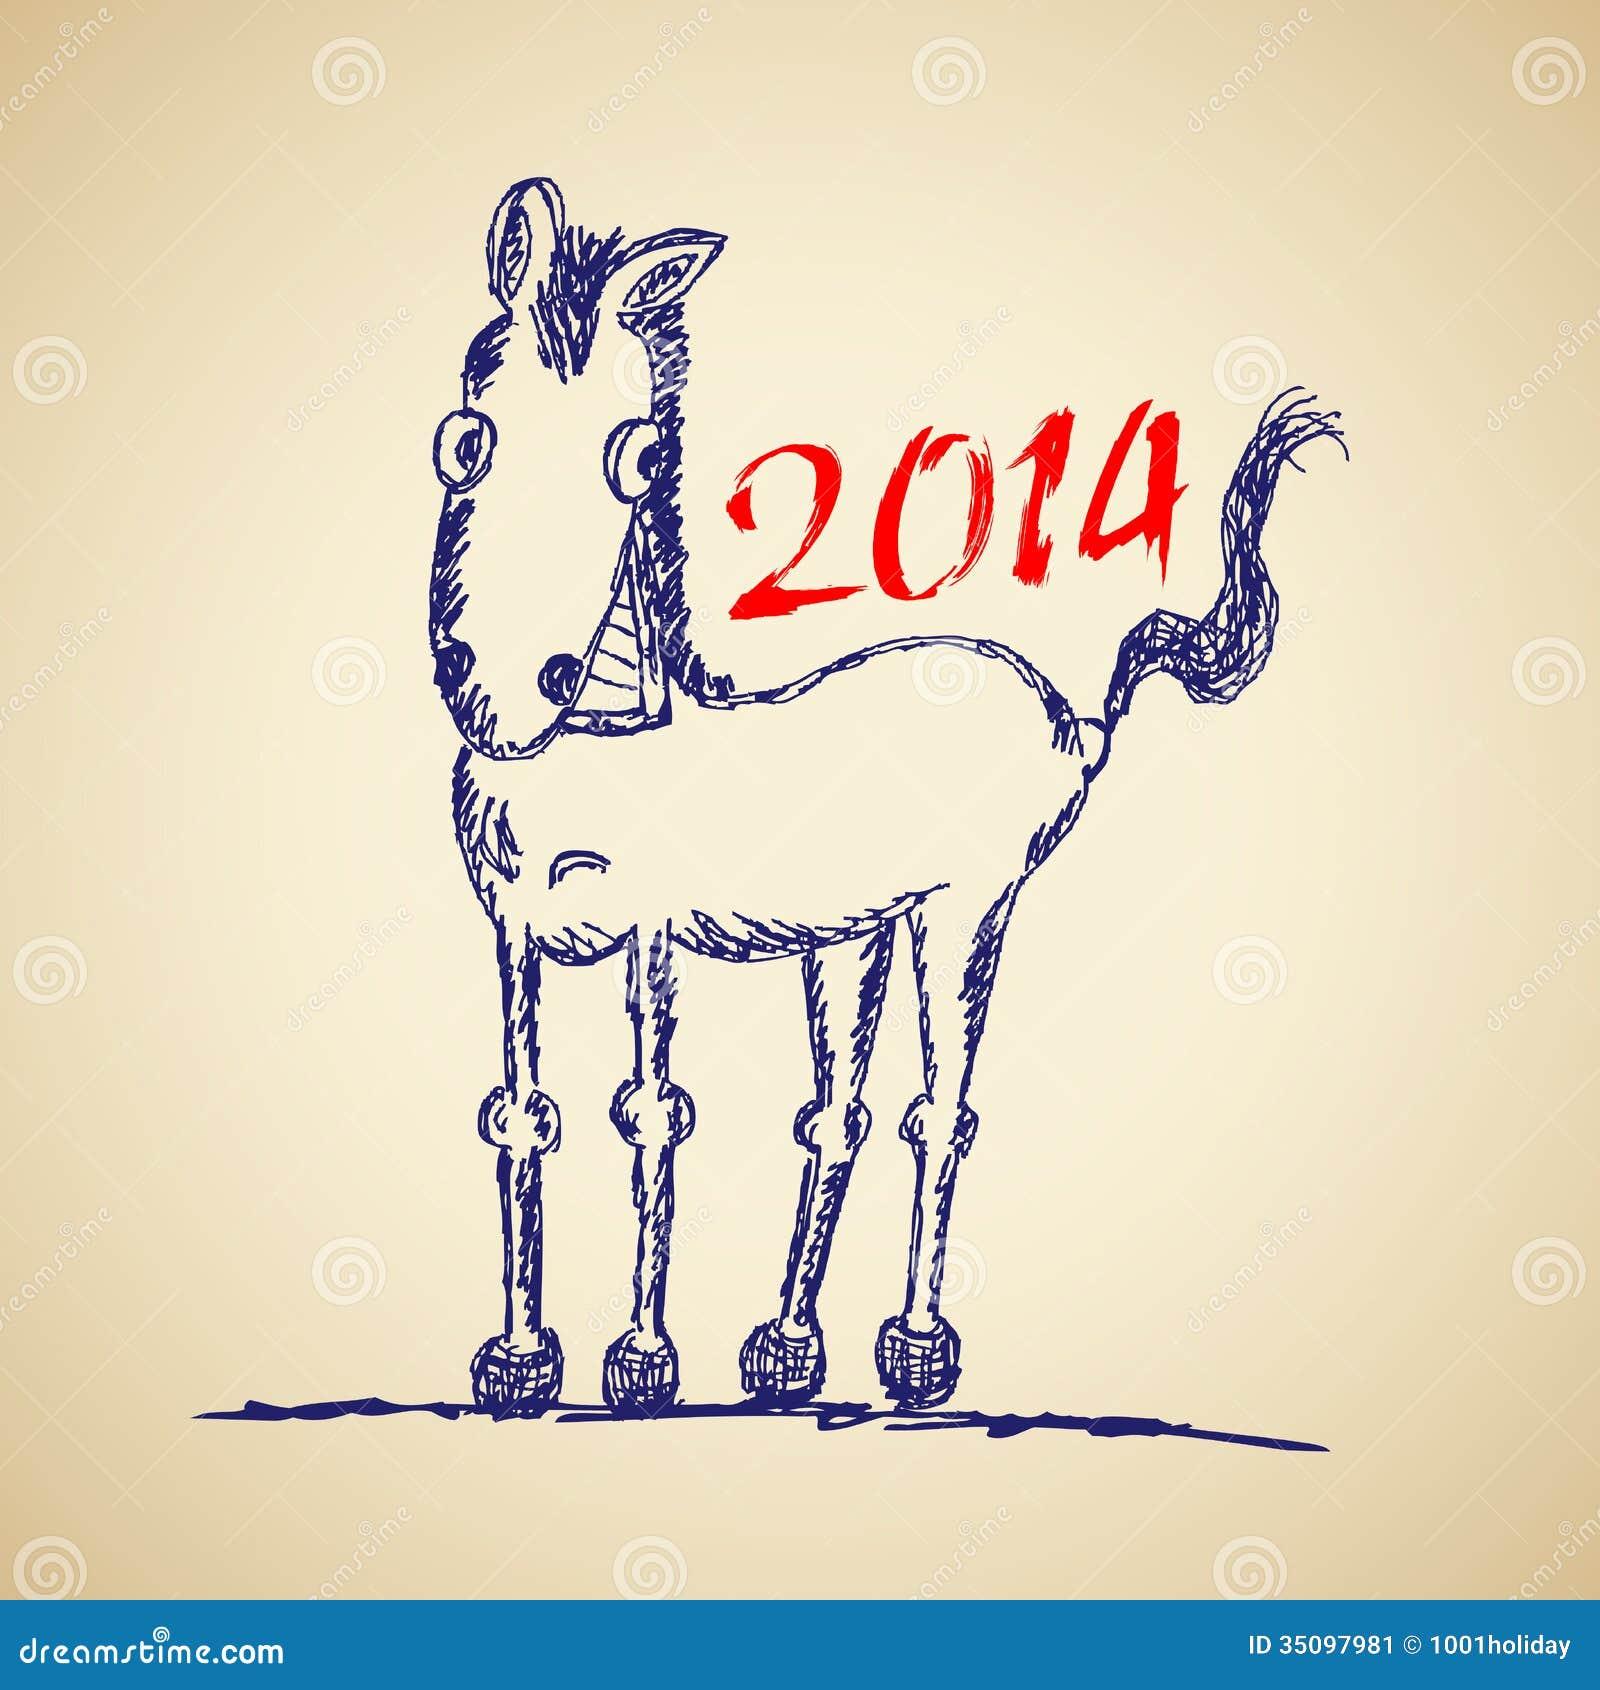 Funny Horse Sketch Stock Vector Illustration Of Equestrian 35097981